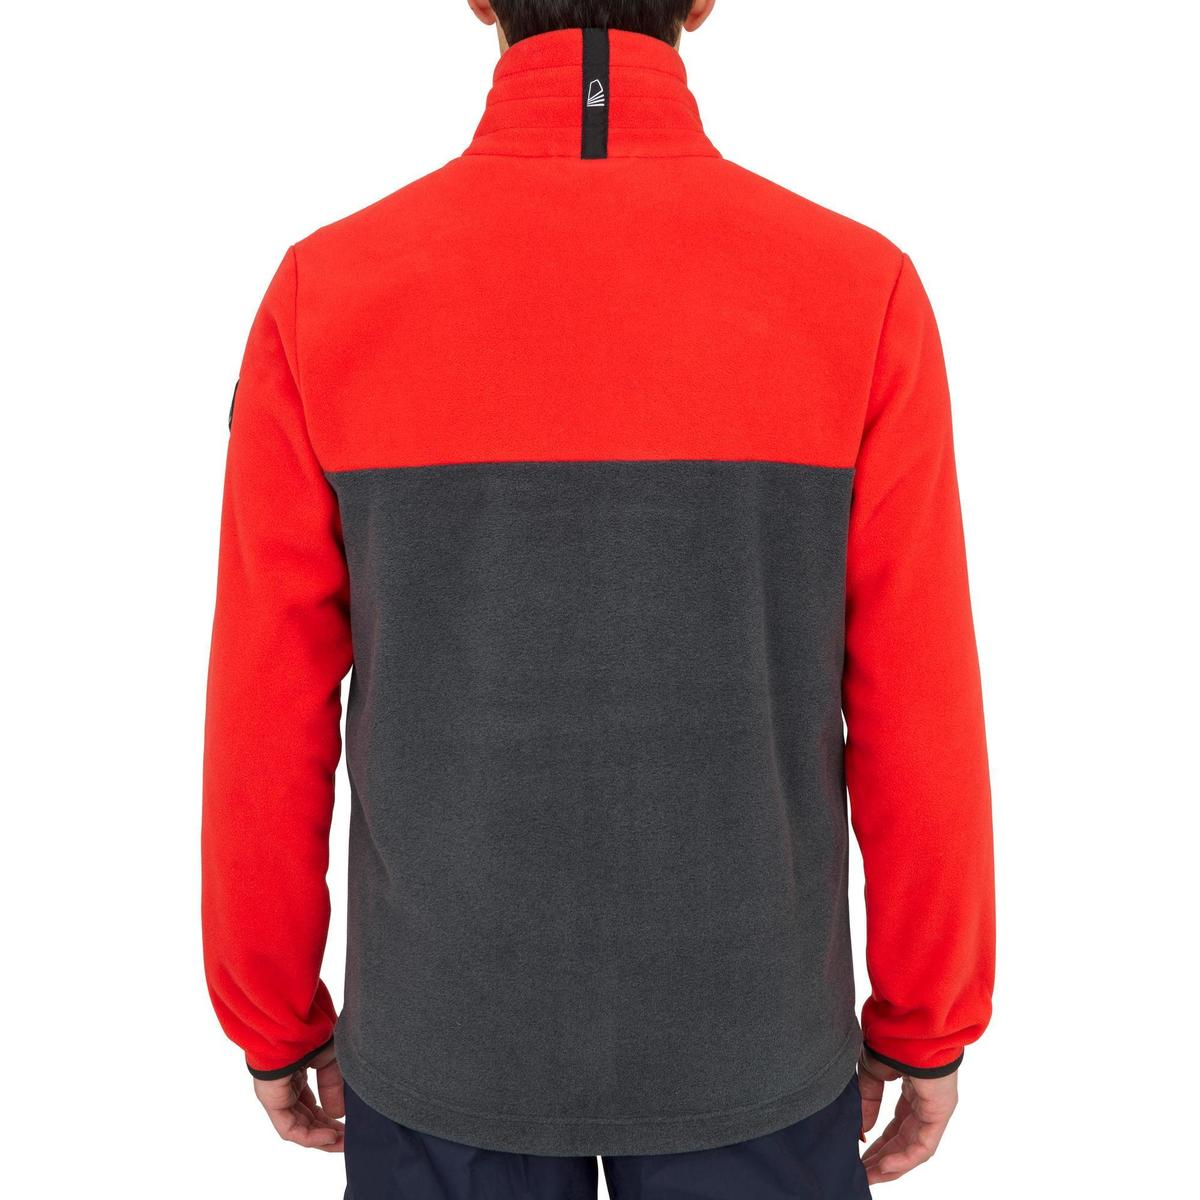 Bild 5 von Fleecejacke Segeln Race Herren grau/rot